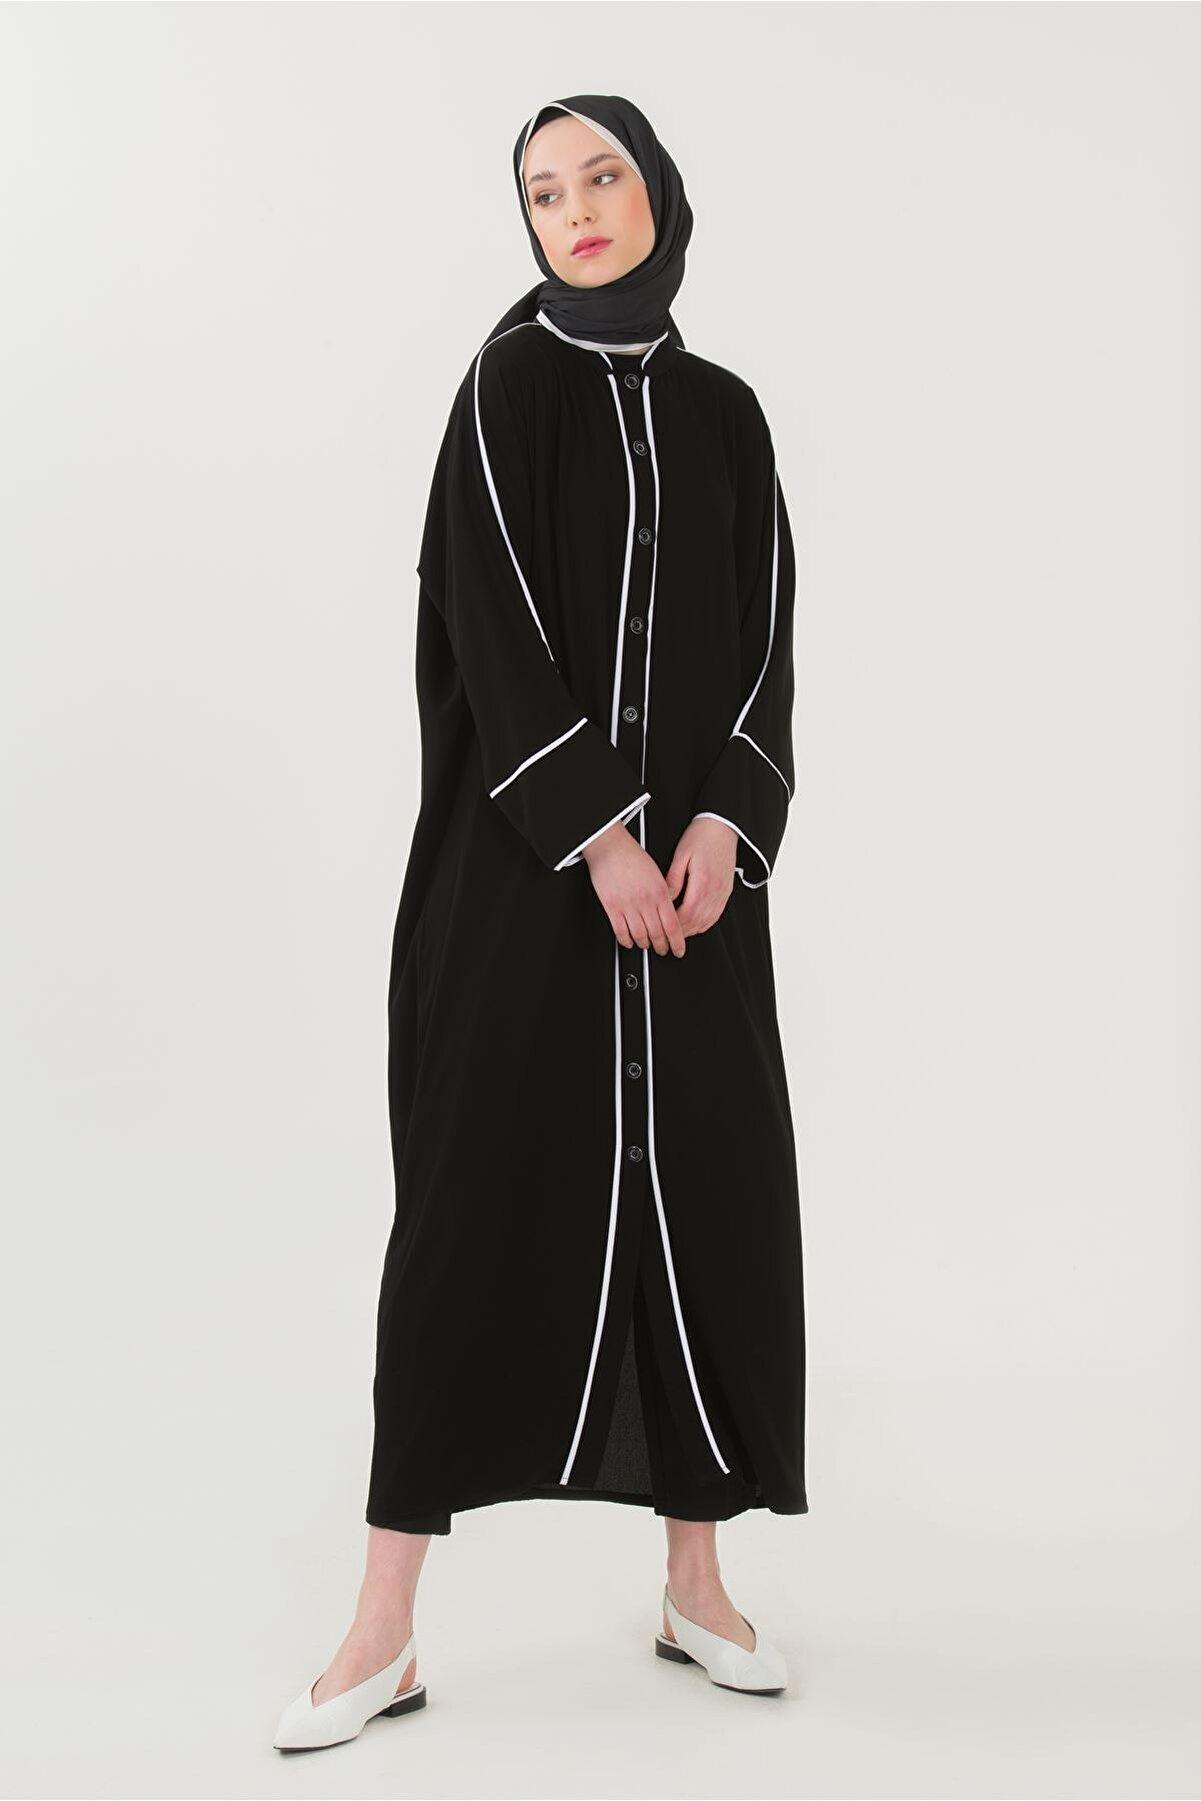 İrva Tesettür Biyeli Abaya Siyah